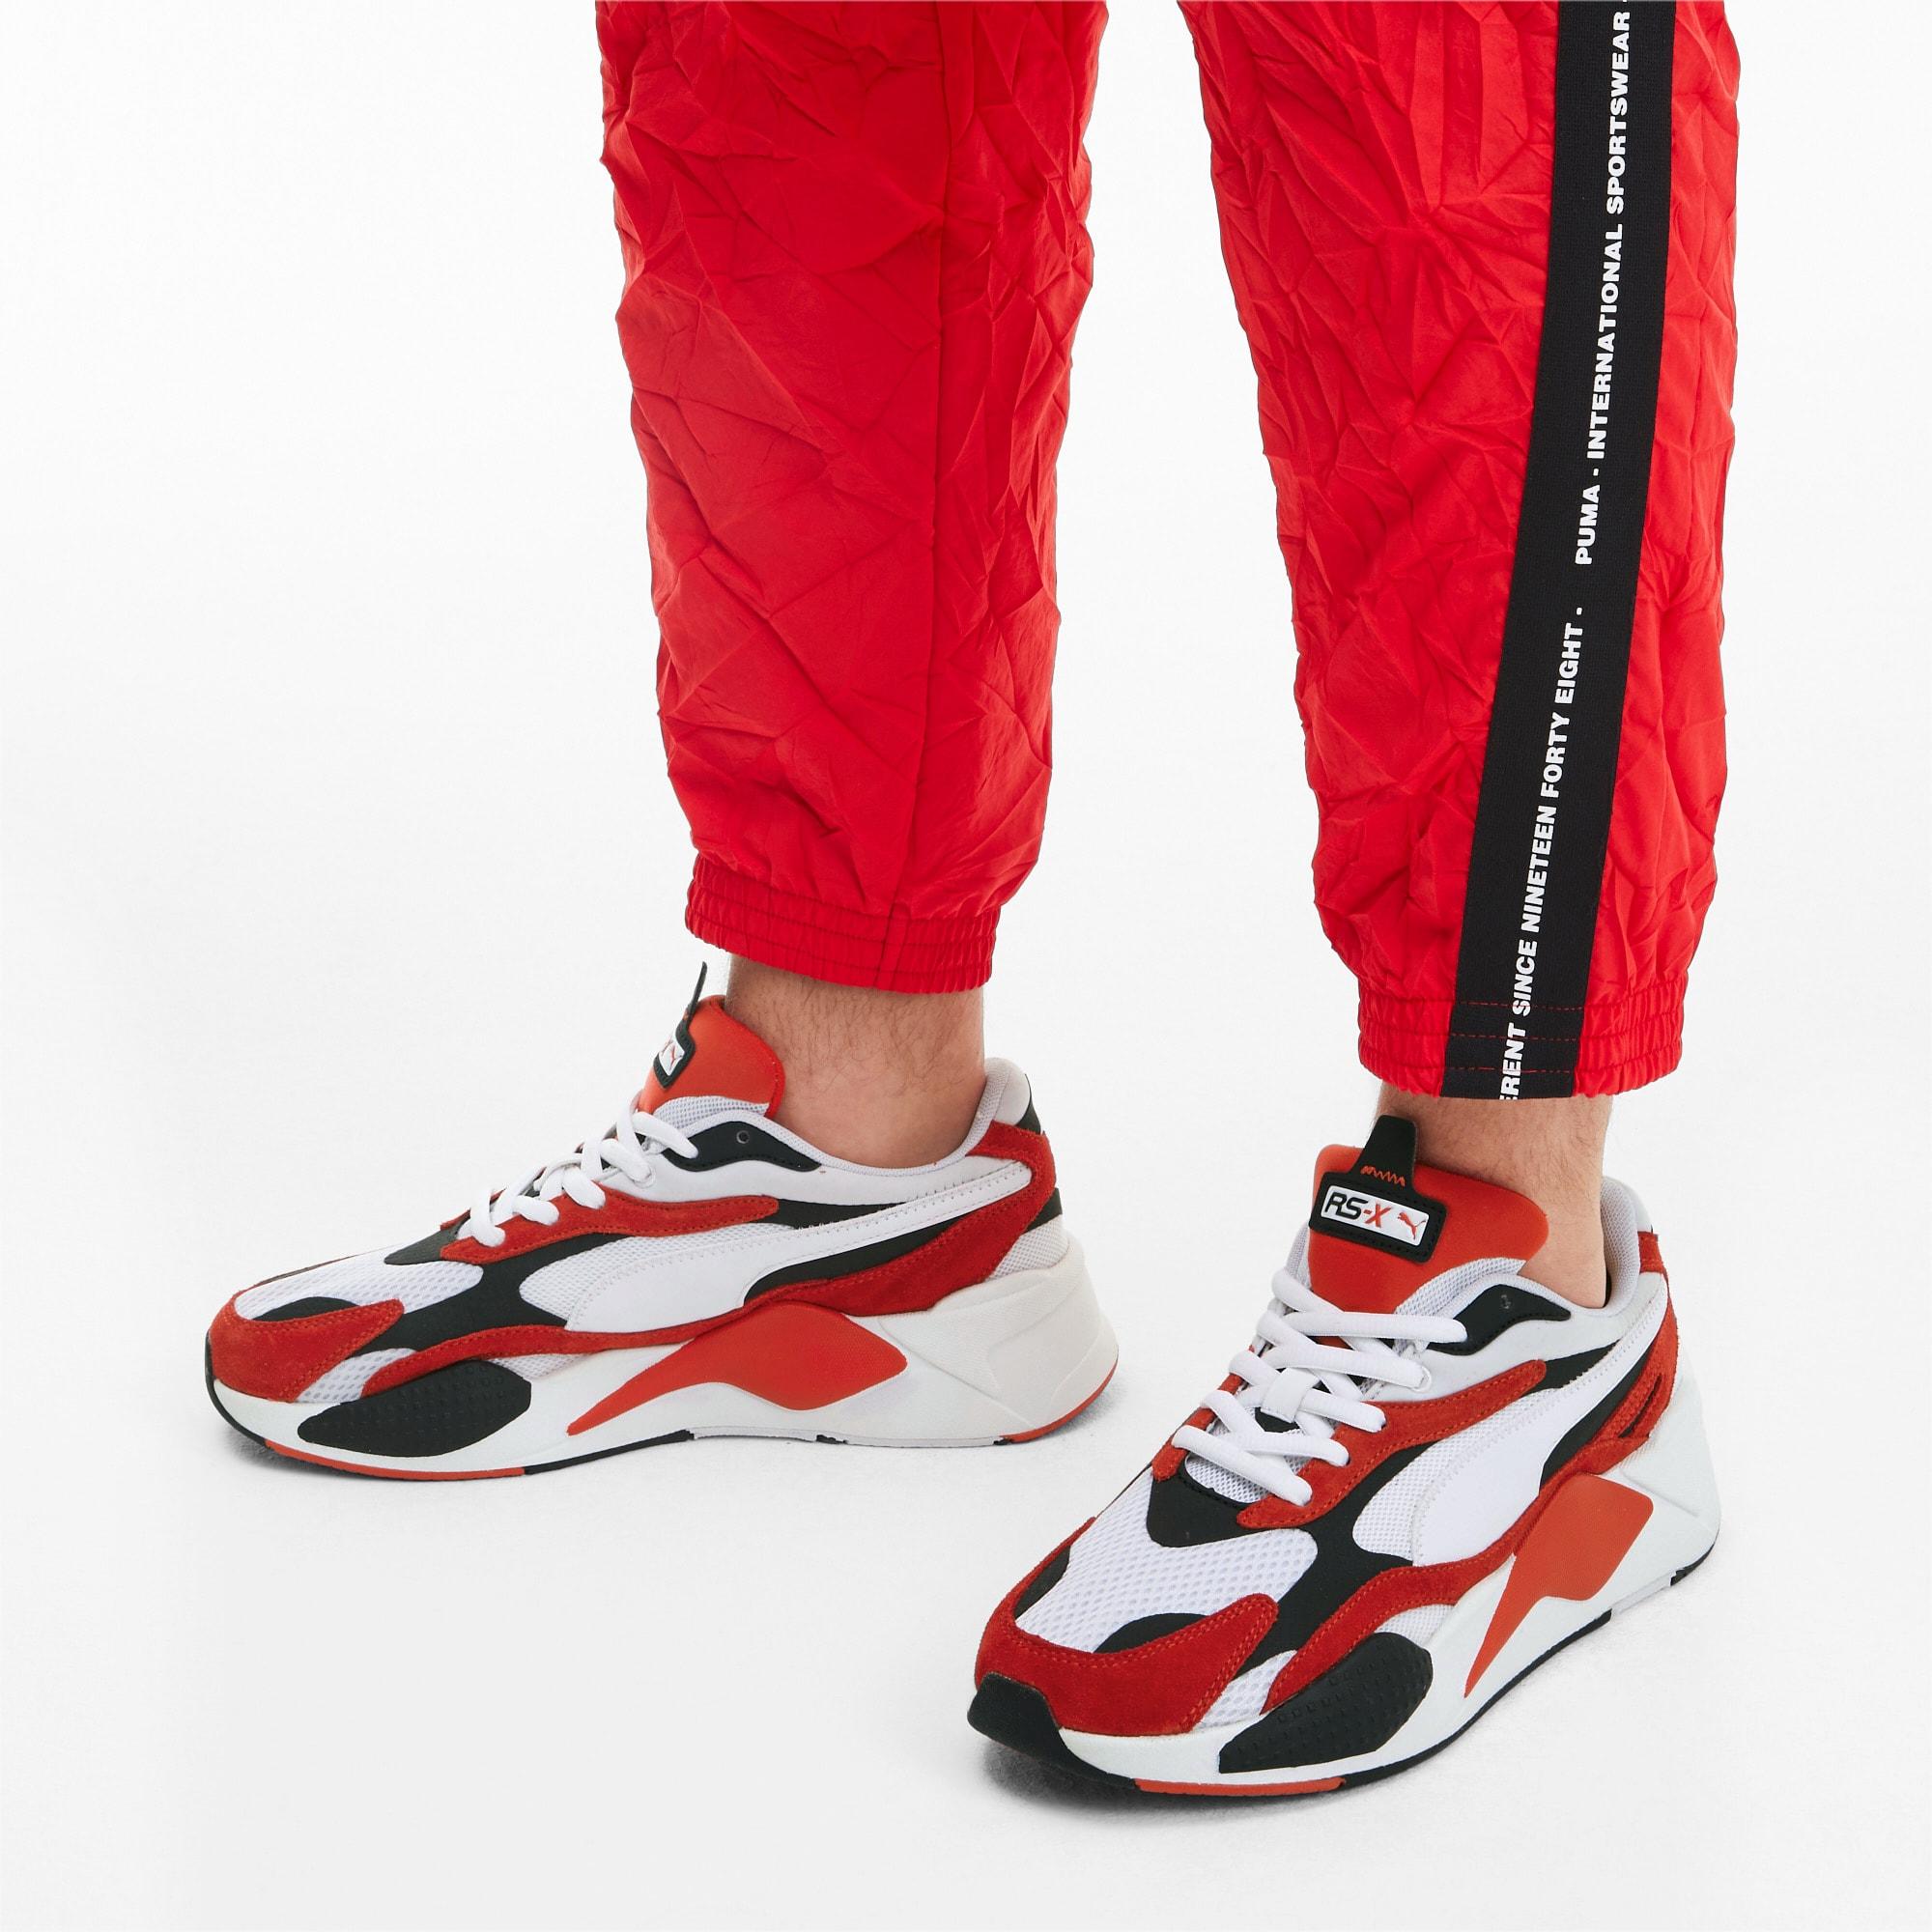 RS-X³ Super Men's Sneakers